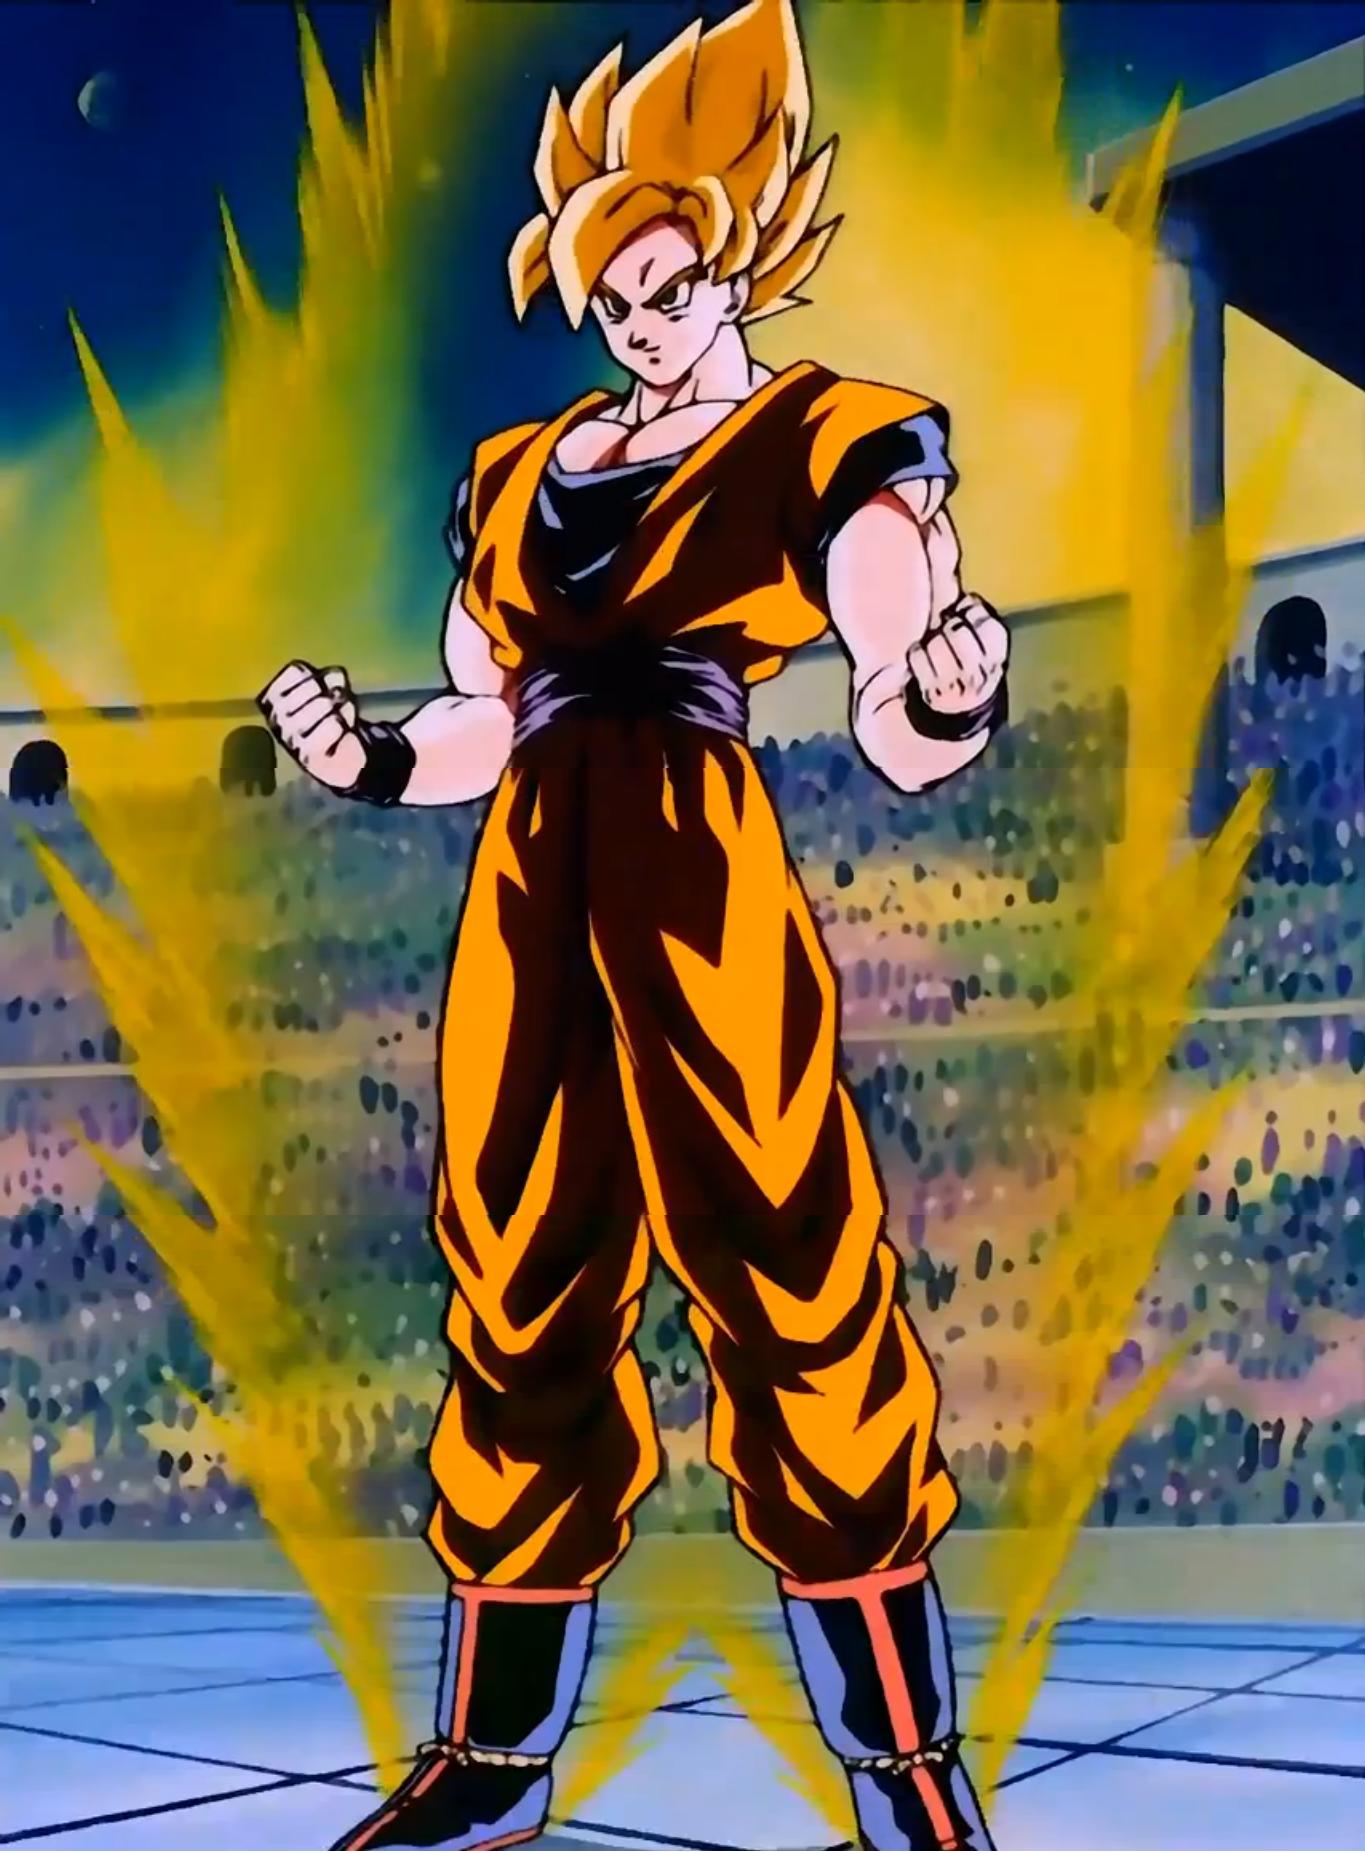 Dragonball Z Super Saiyan Goku id 185341 1365x1853